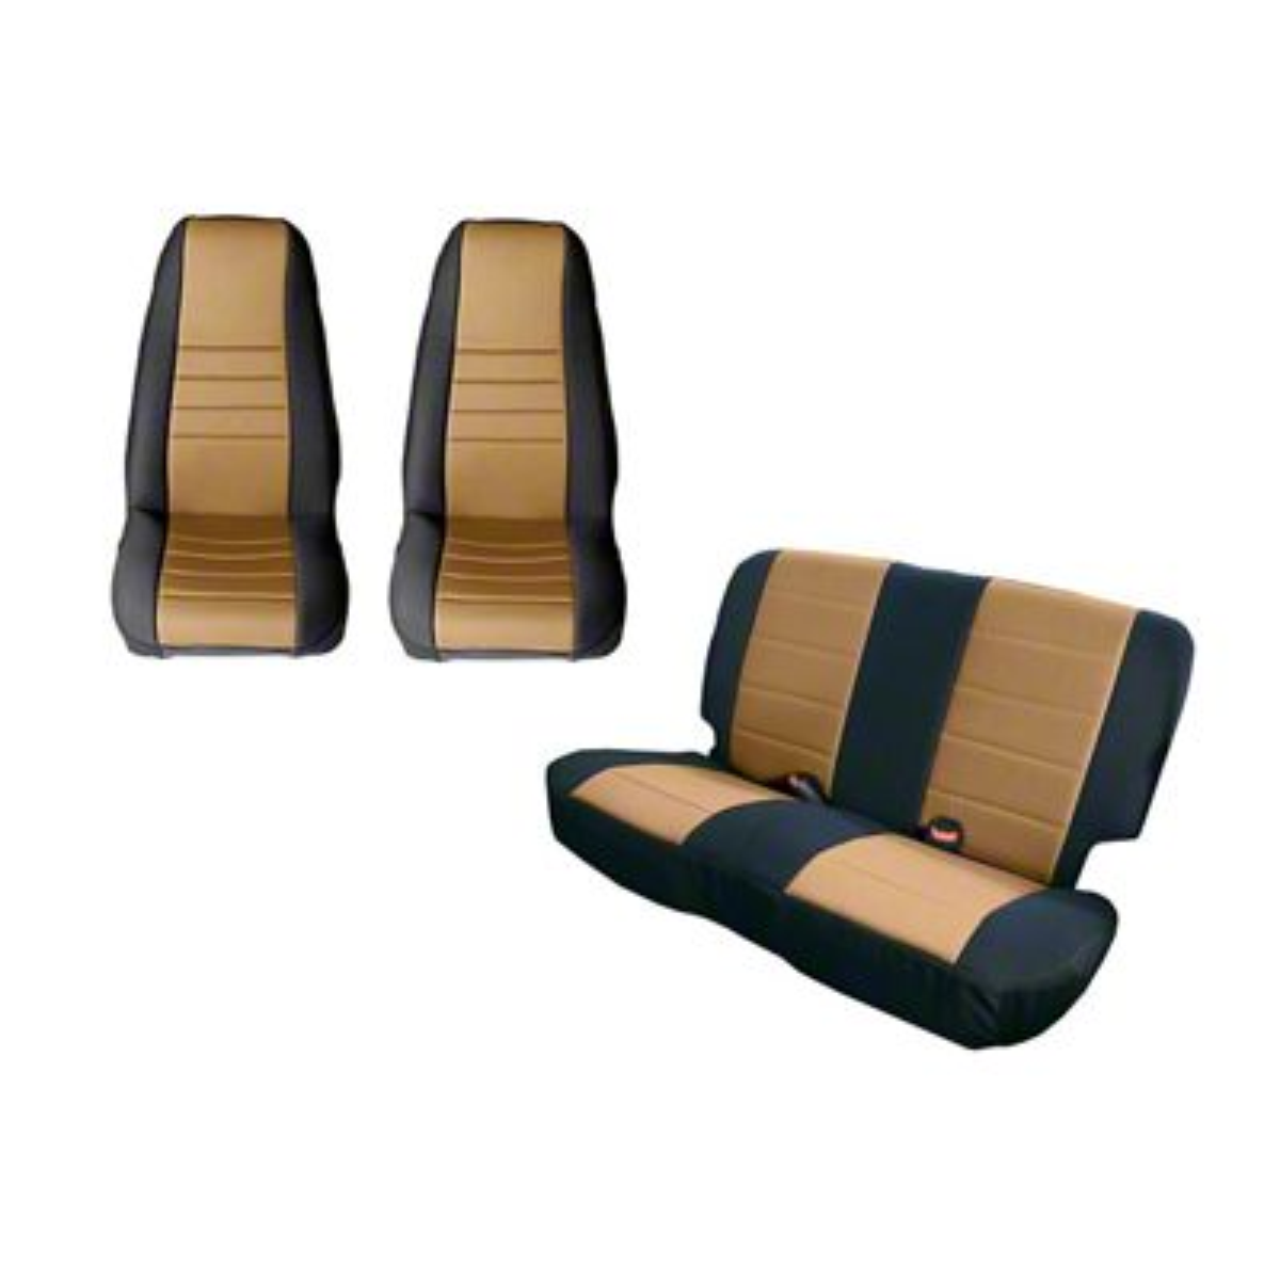 Rugged Ridge Seat Cover Kit - Black/Tan (87-90 Jeep Wrangler YJ)